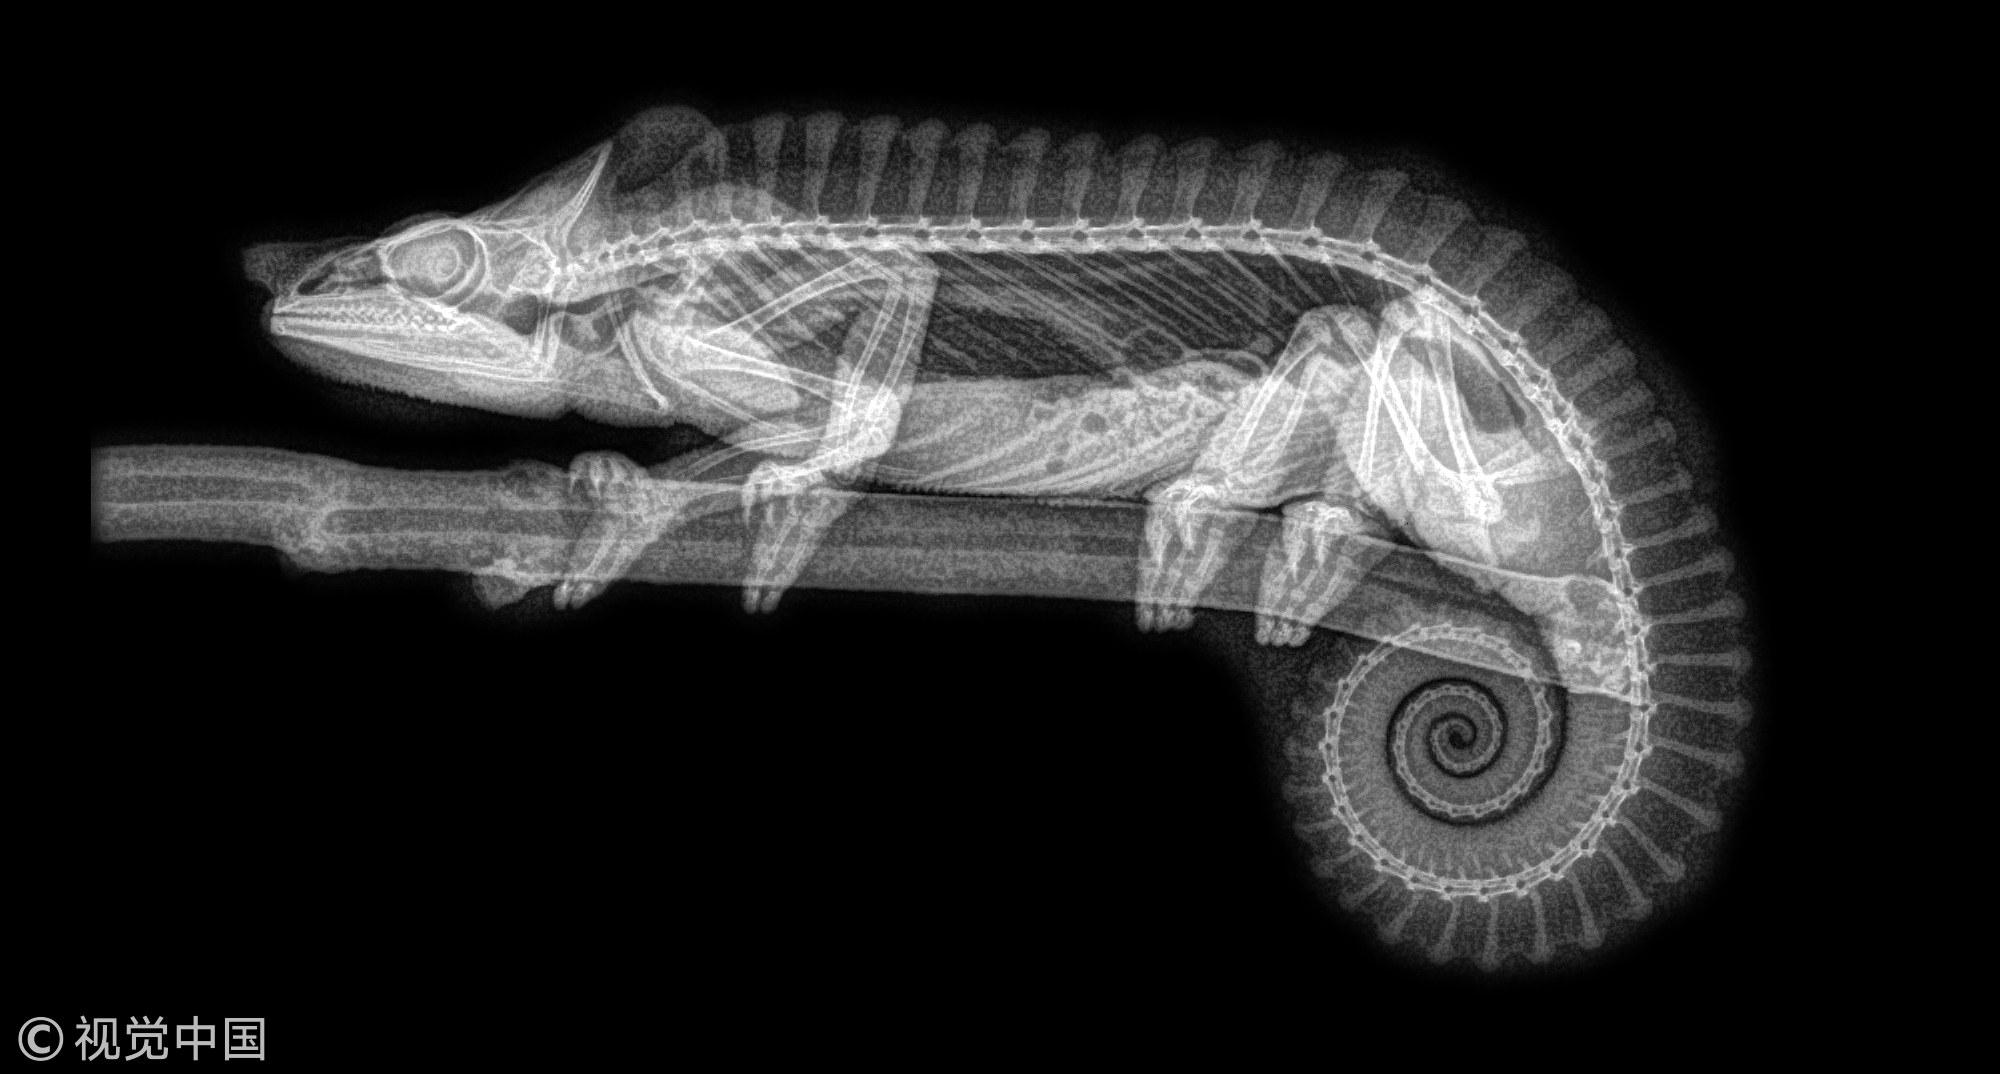 X-rays of Oregon Zoo animals yield spooky Halloween vibes